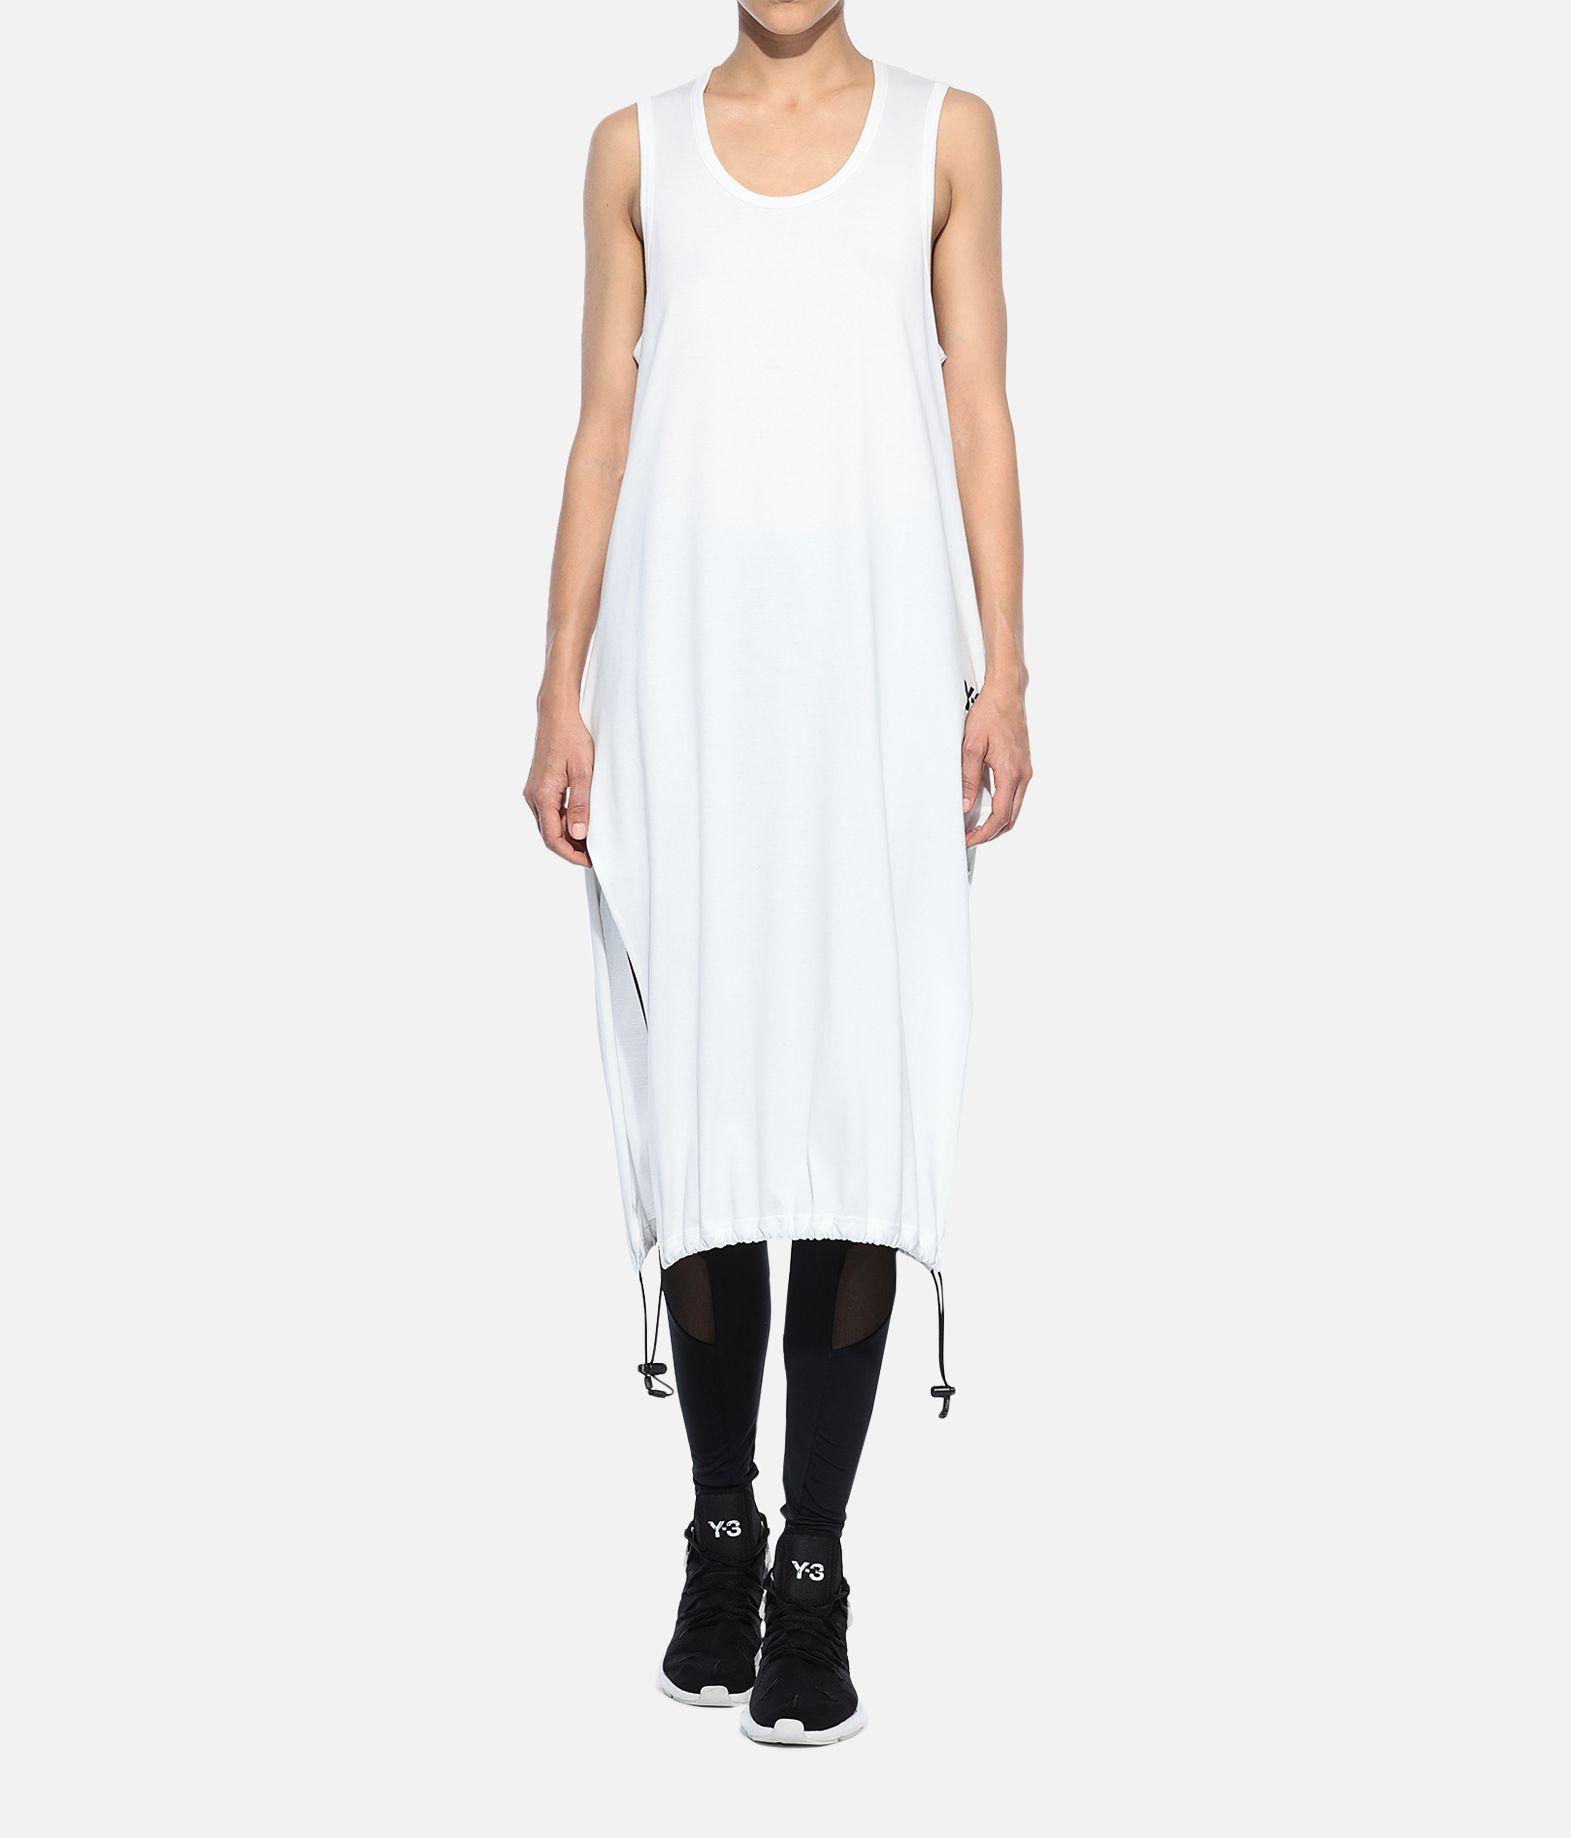 Y-3 Y-3 Drawstring Long Tank Top Sleeveless t-shirt Woman a